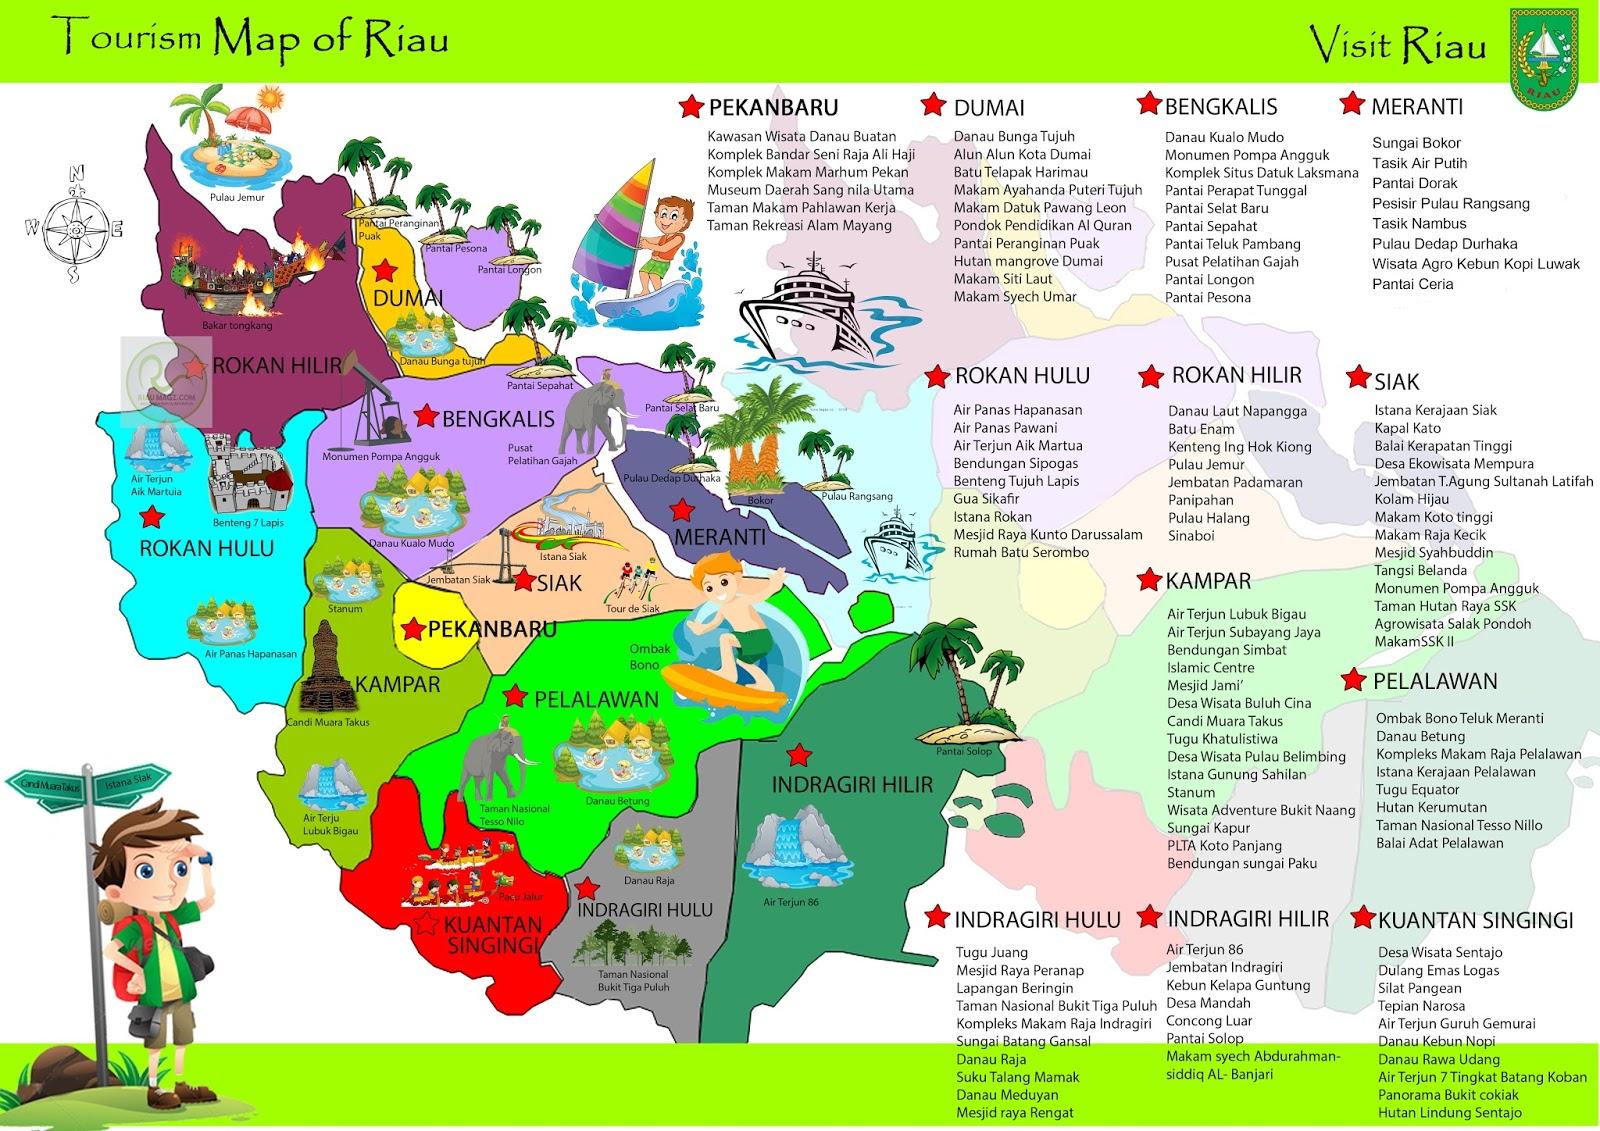 Peta Wisata Riau - Riau Tourism Map - Indonesia - RiauMagz